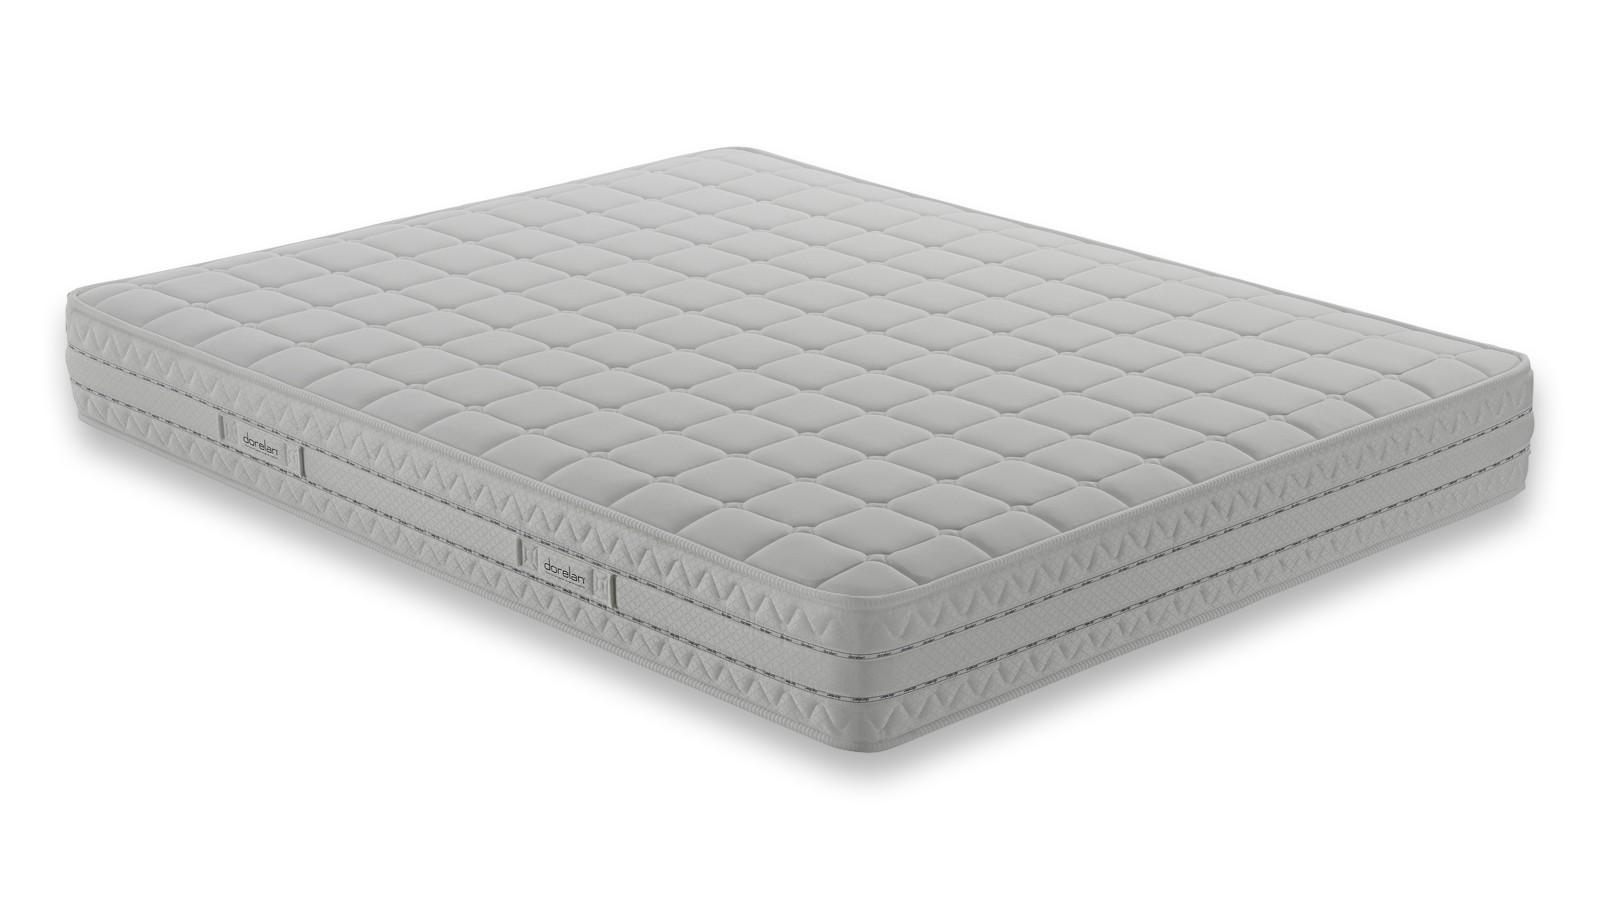 Sleep Comfort Plus Mattress